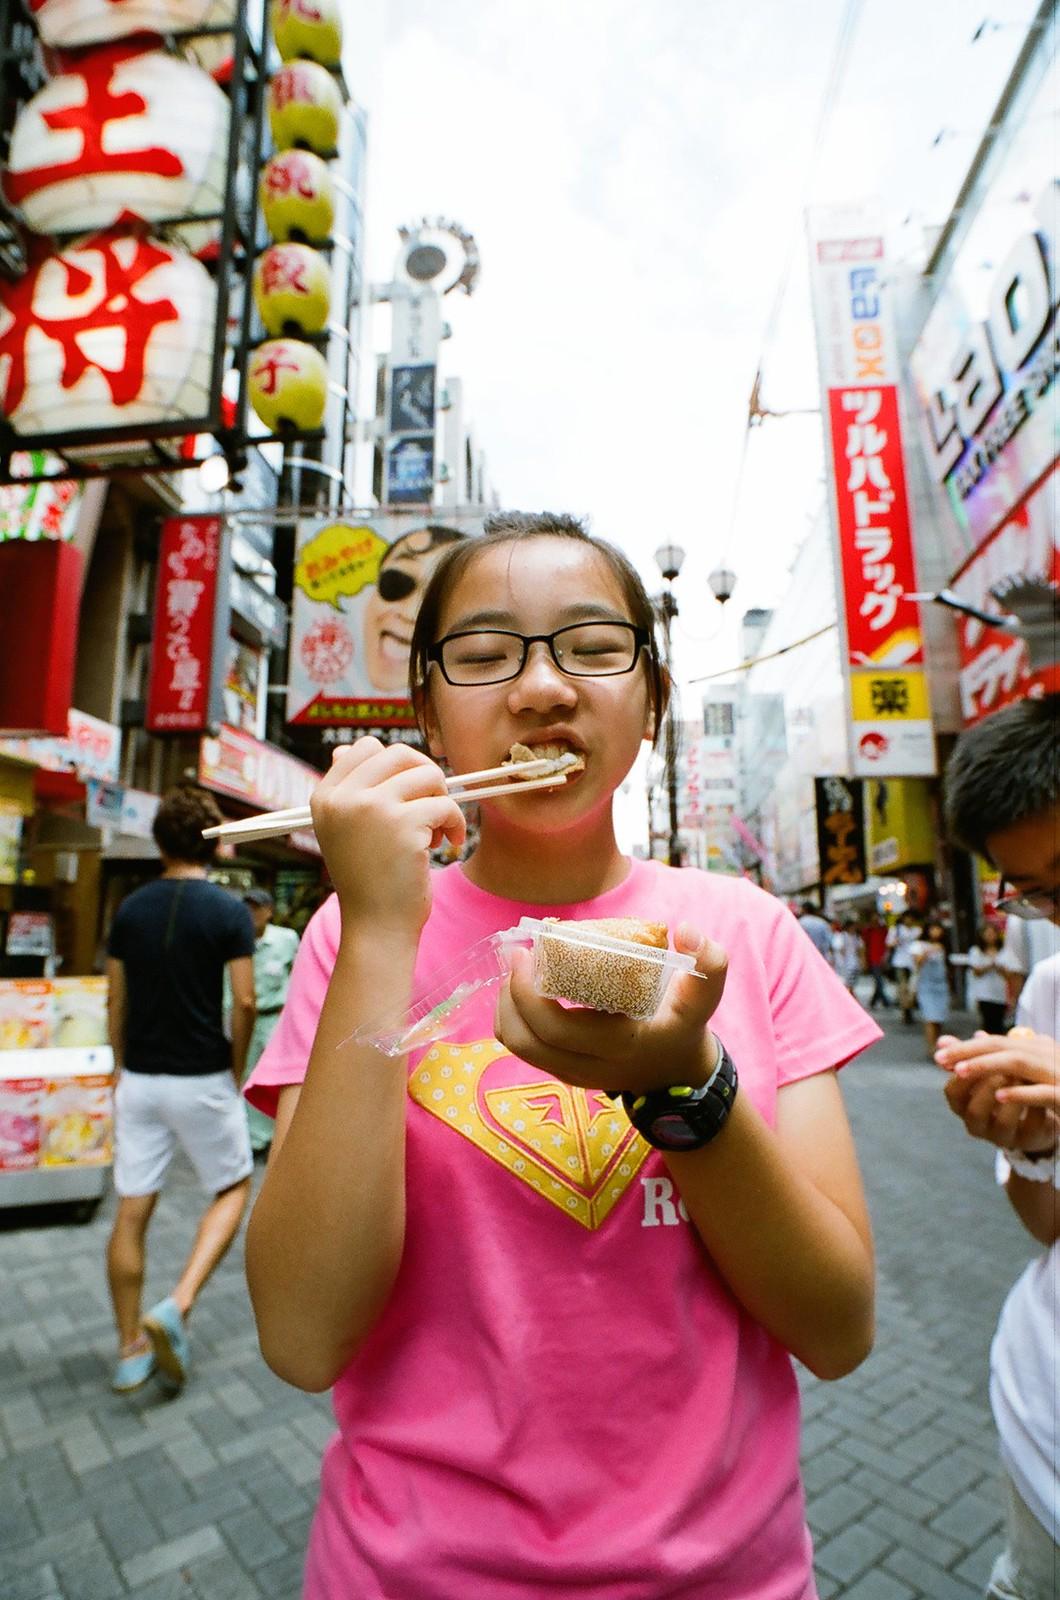 Japan easy go